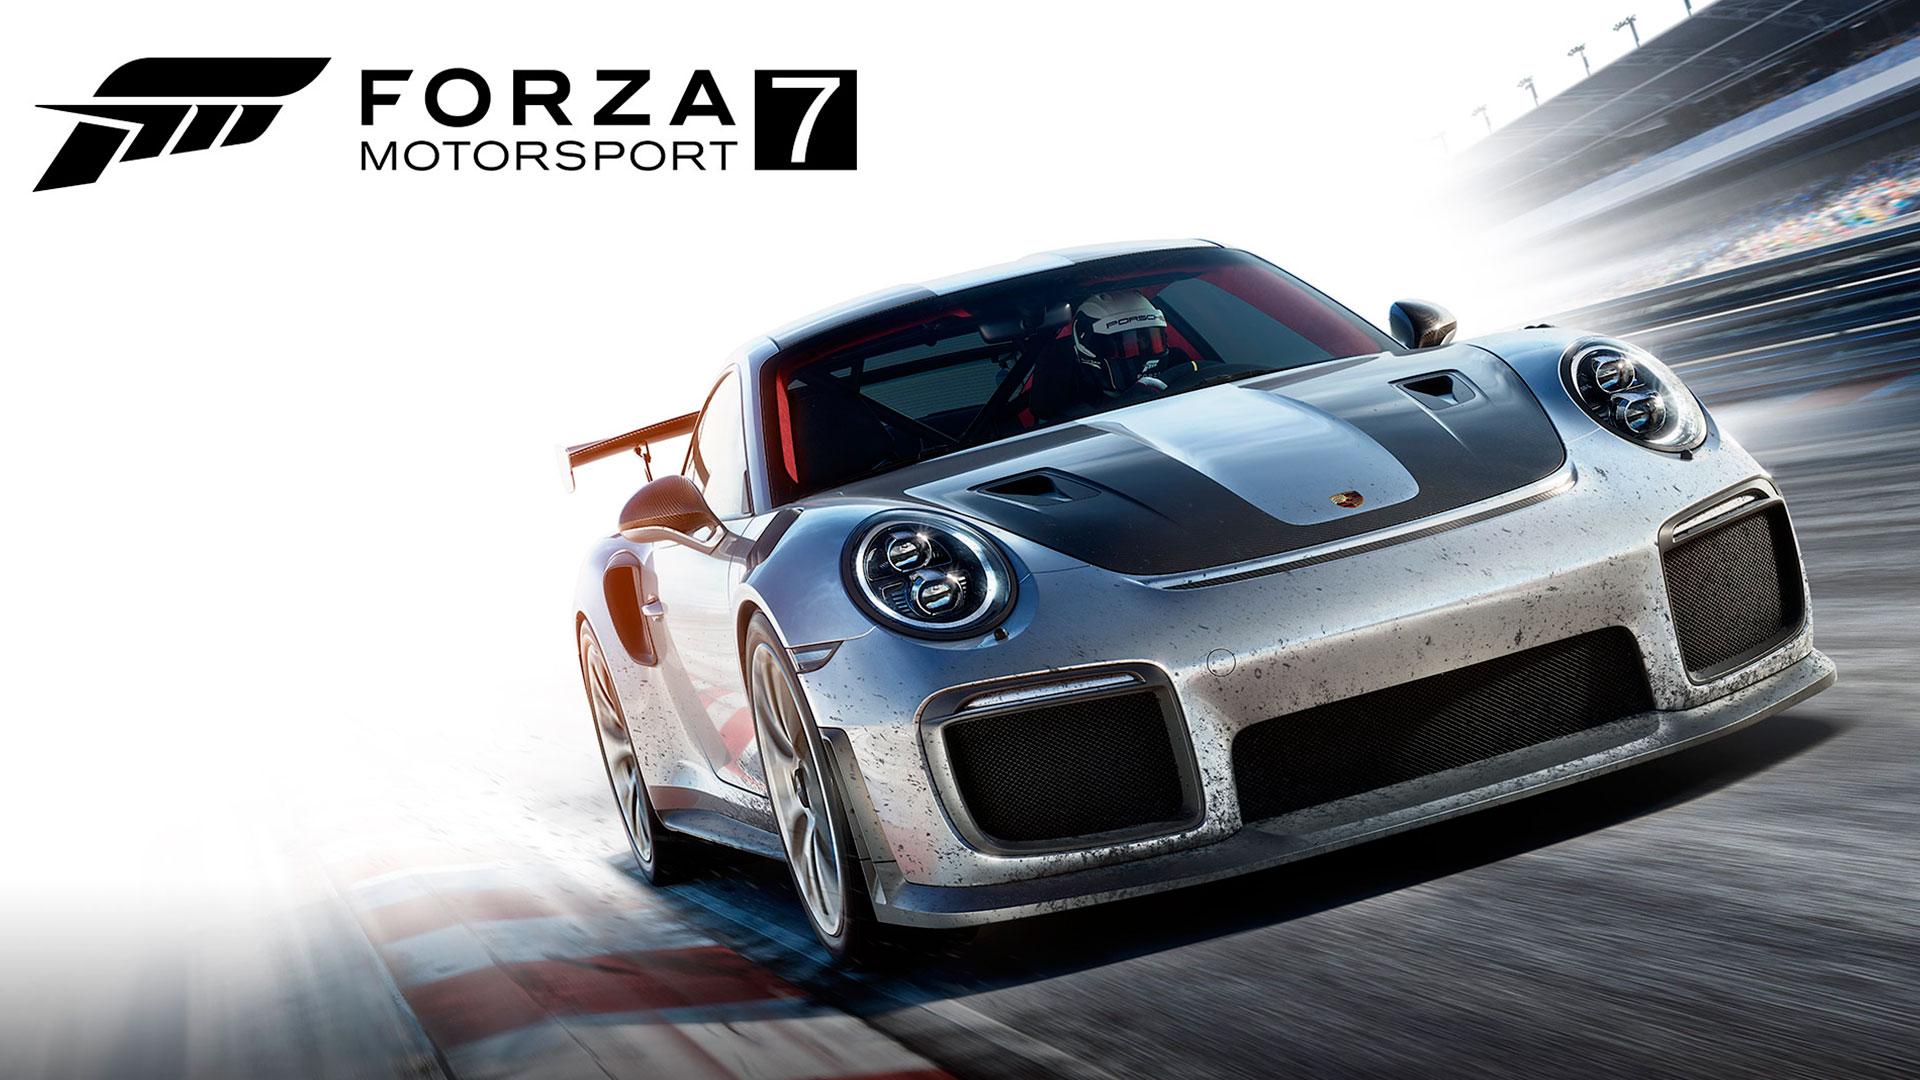 requisitos de Forza Motorsport 7